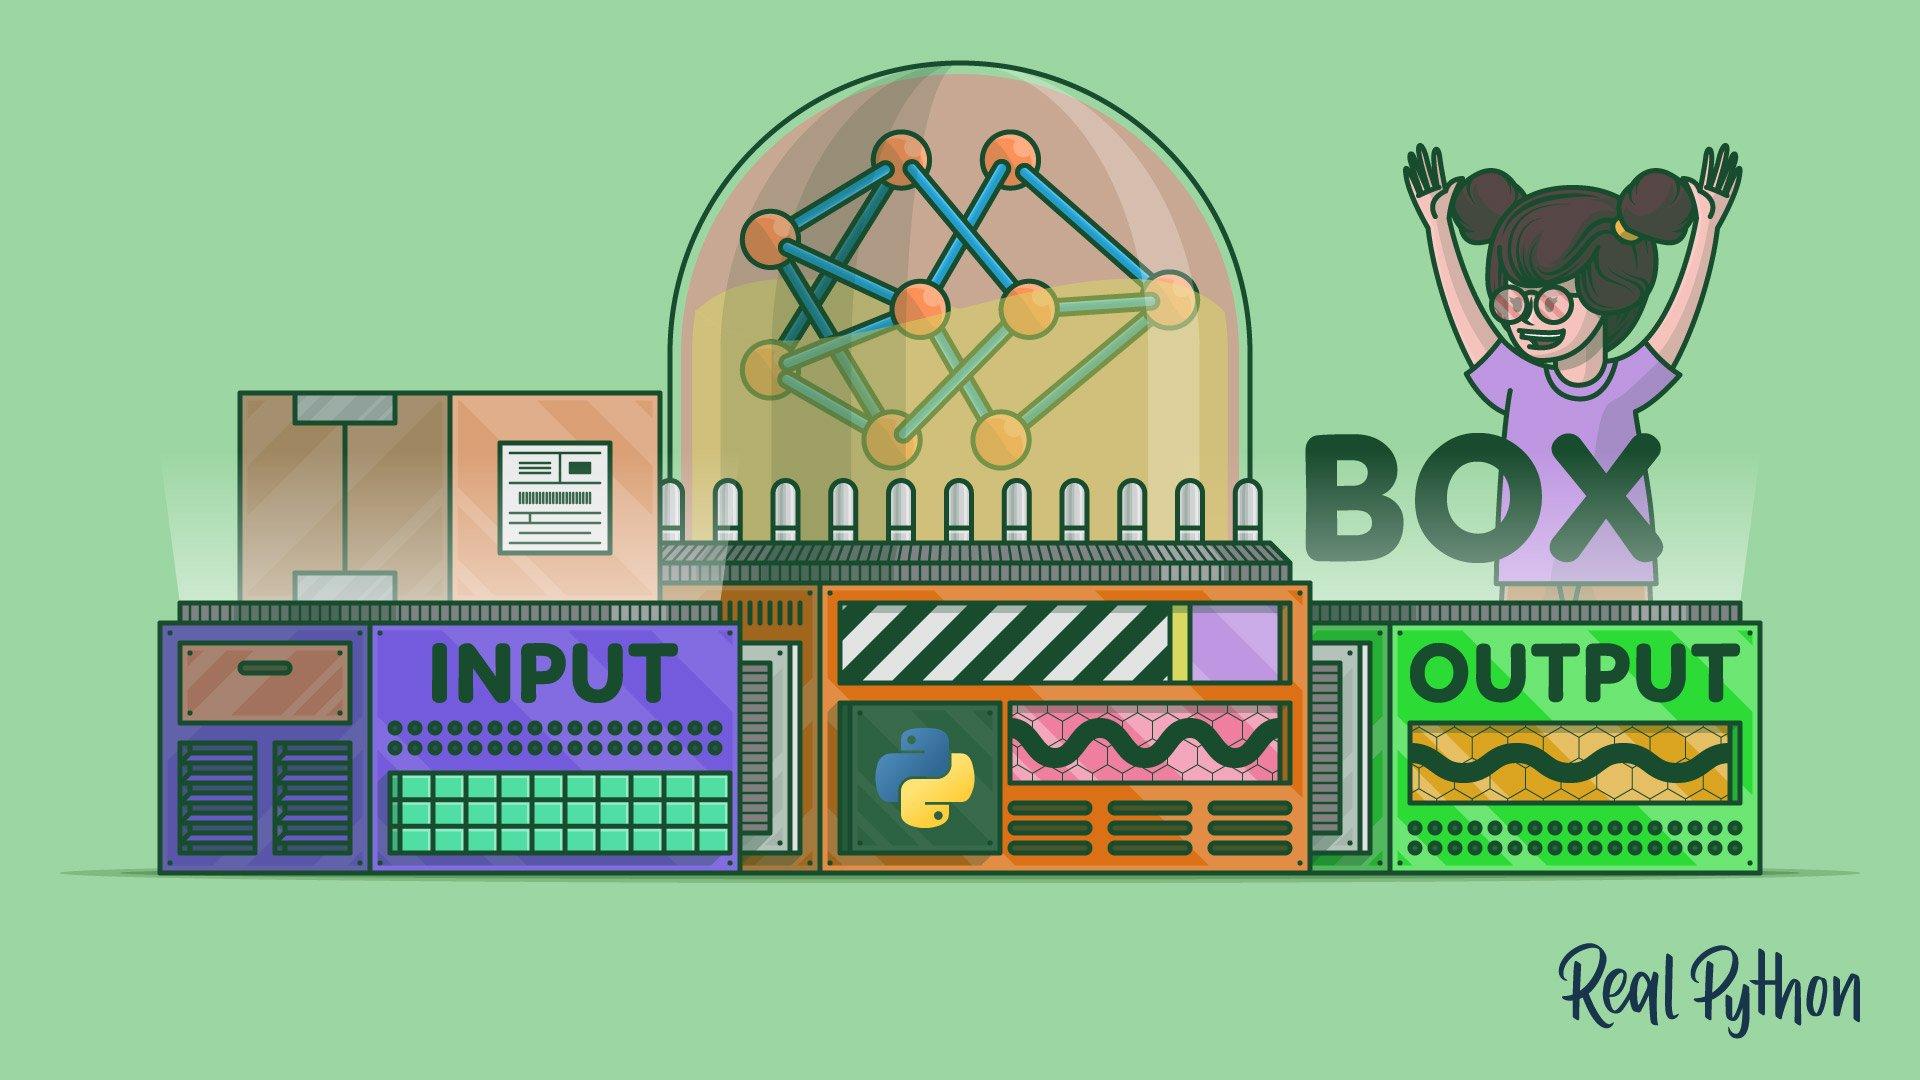 Python AI: How to Build a Neural Network & Make Predictions